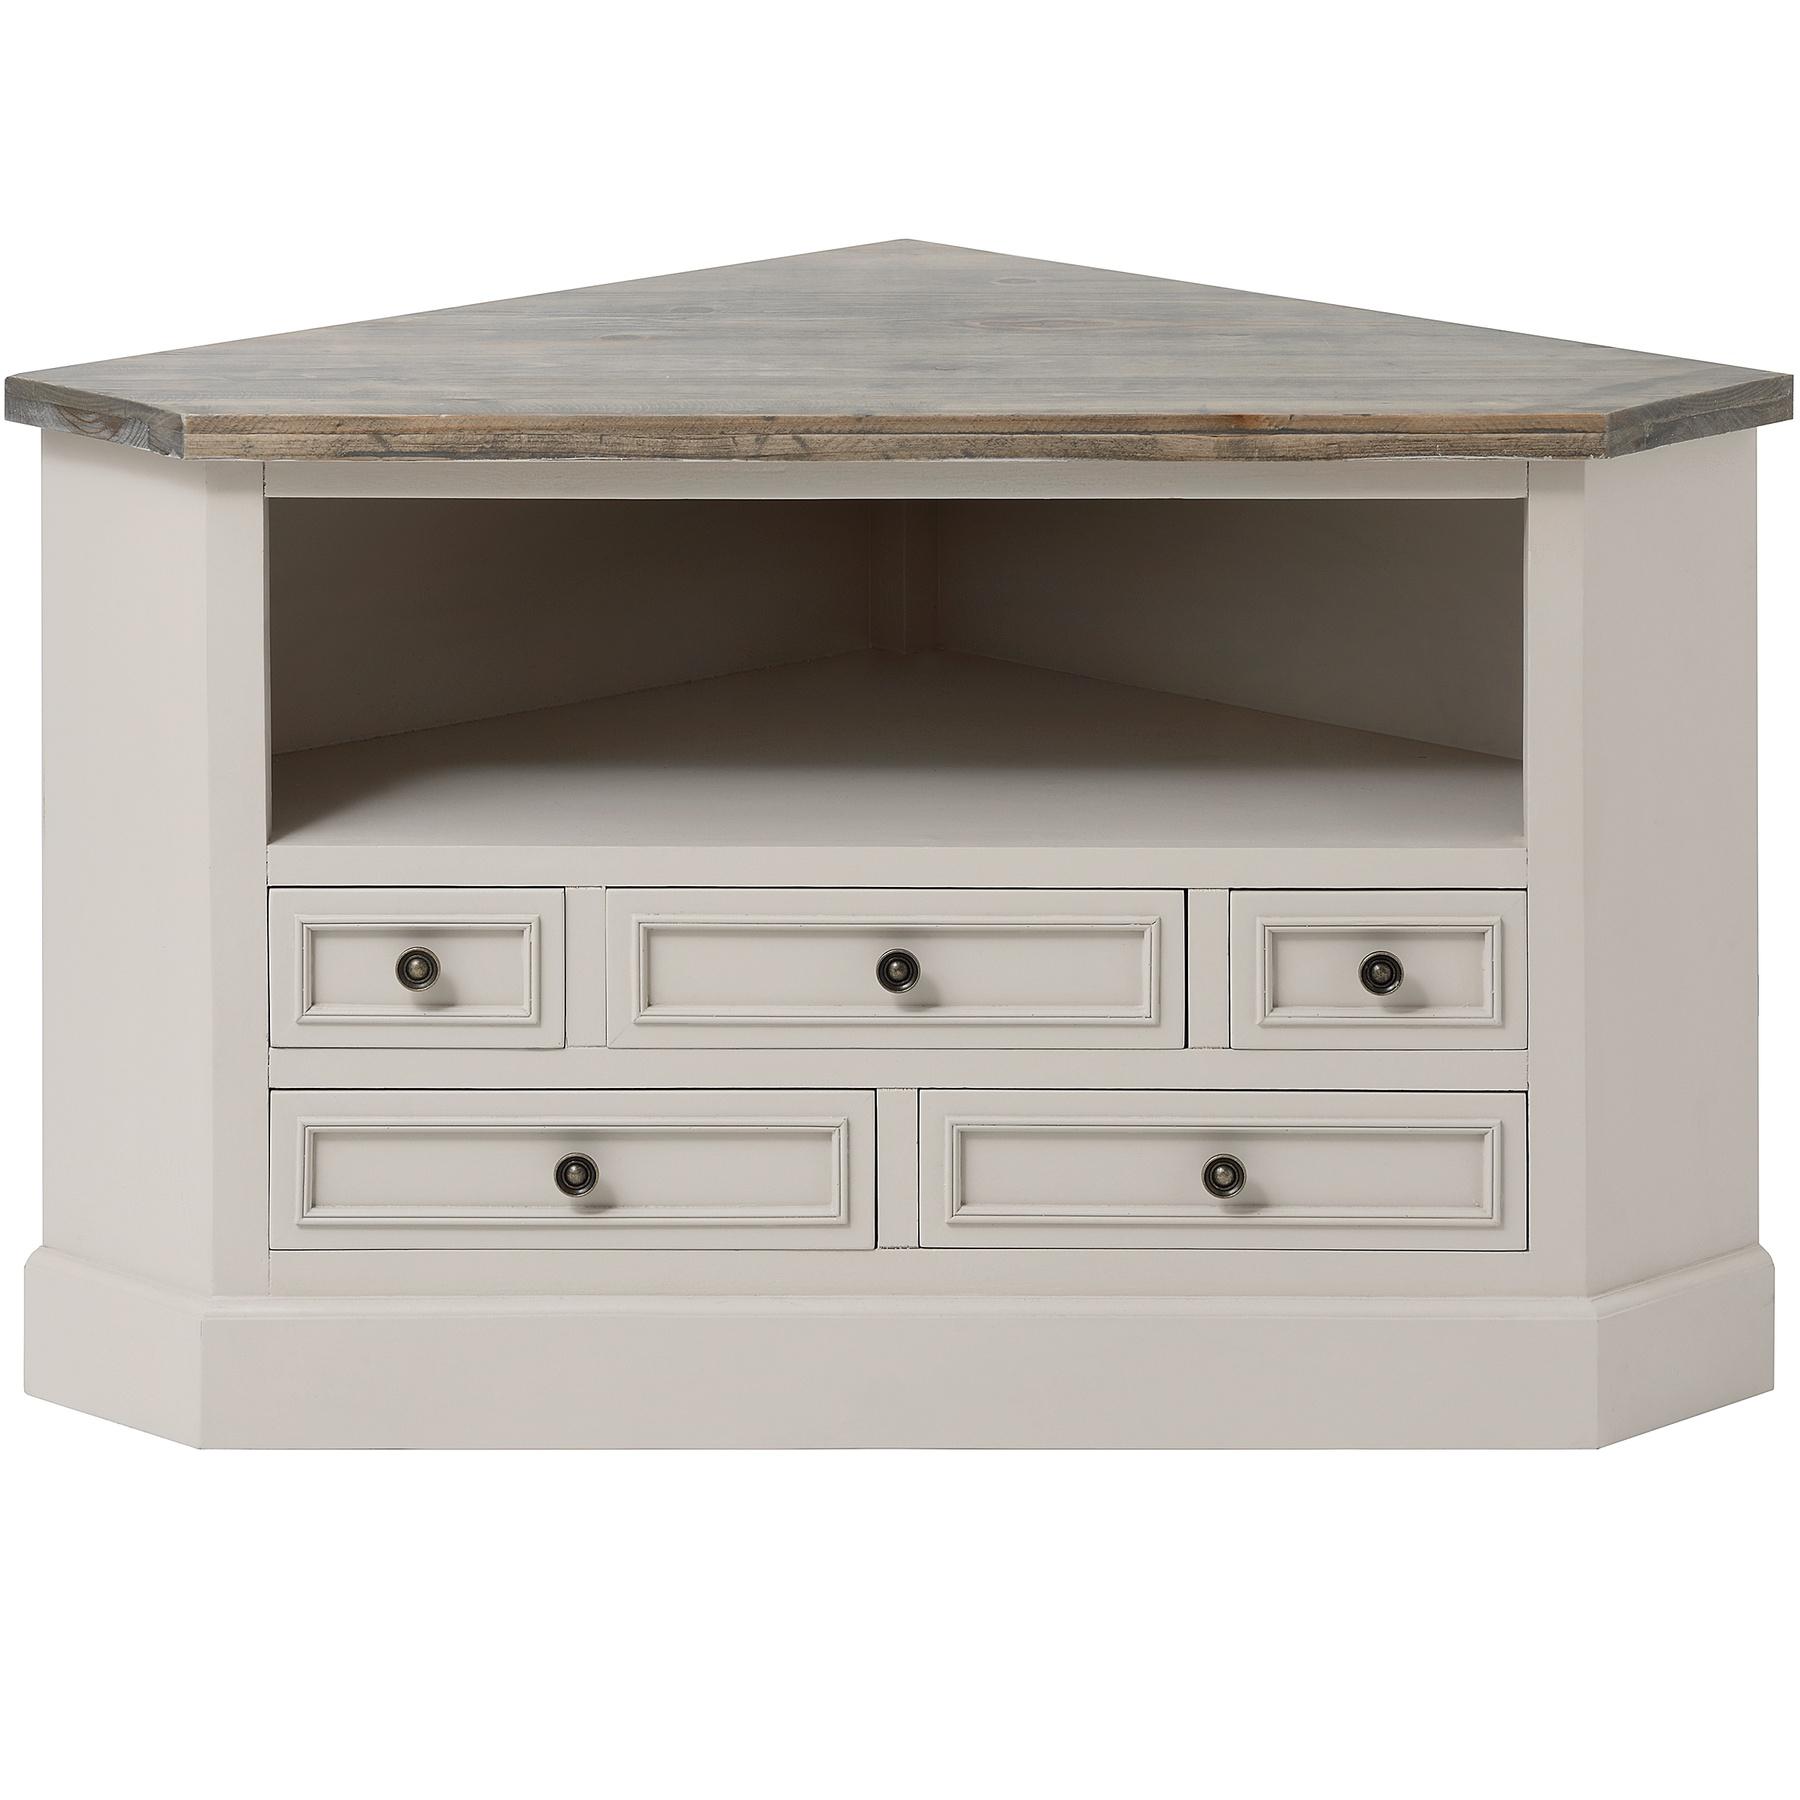 Preferred Living Room : Brilliant Corner Tv Units For Living Room White Corner Within White Corner Tv Cabinets (Gallery 4 of 20)